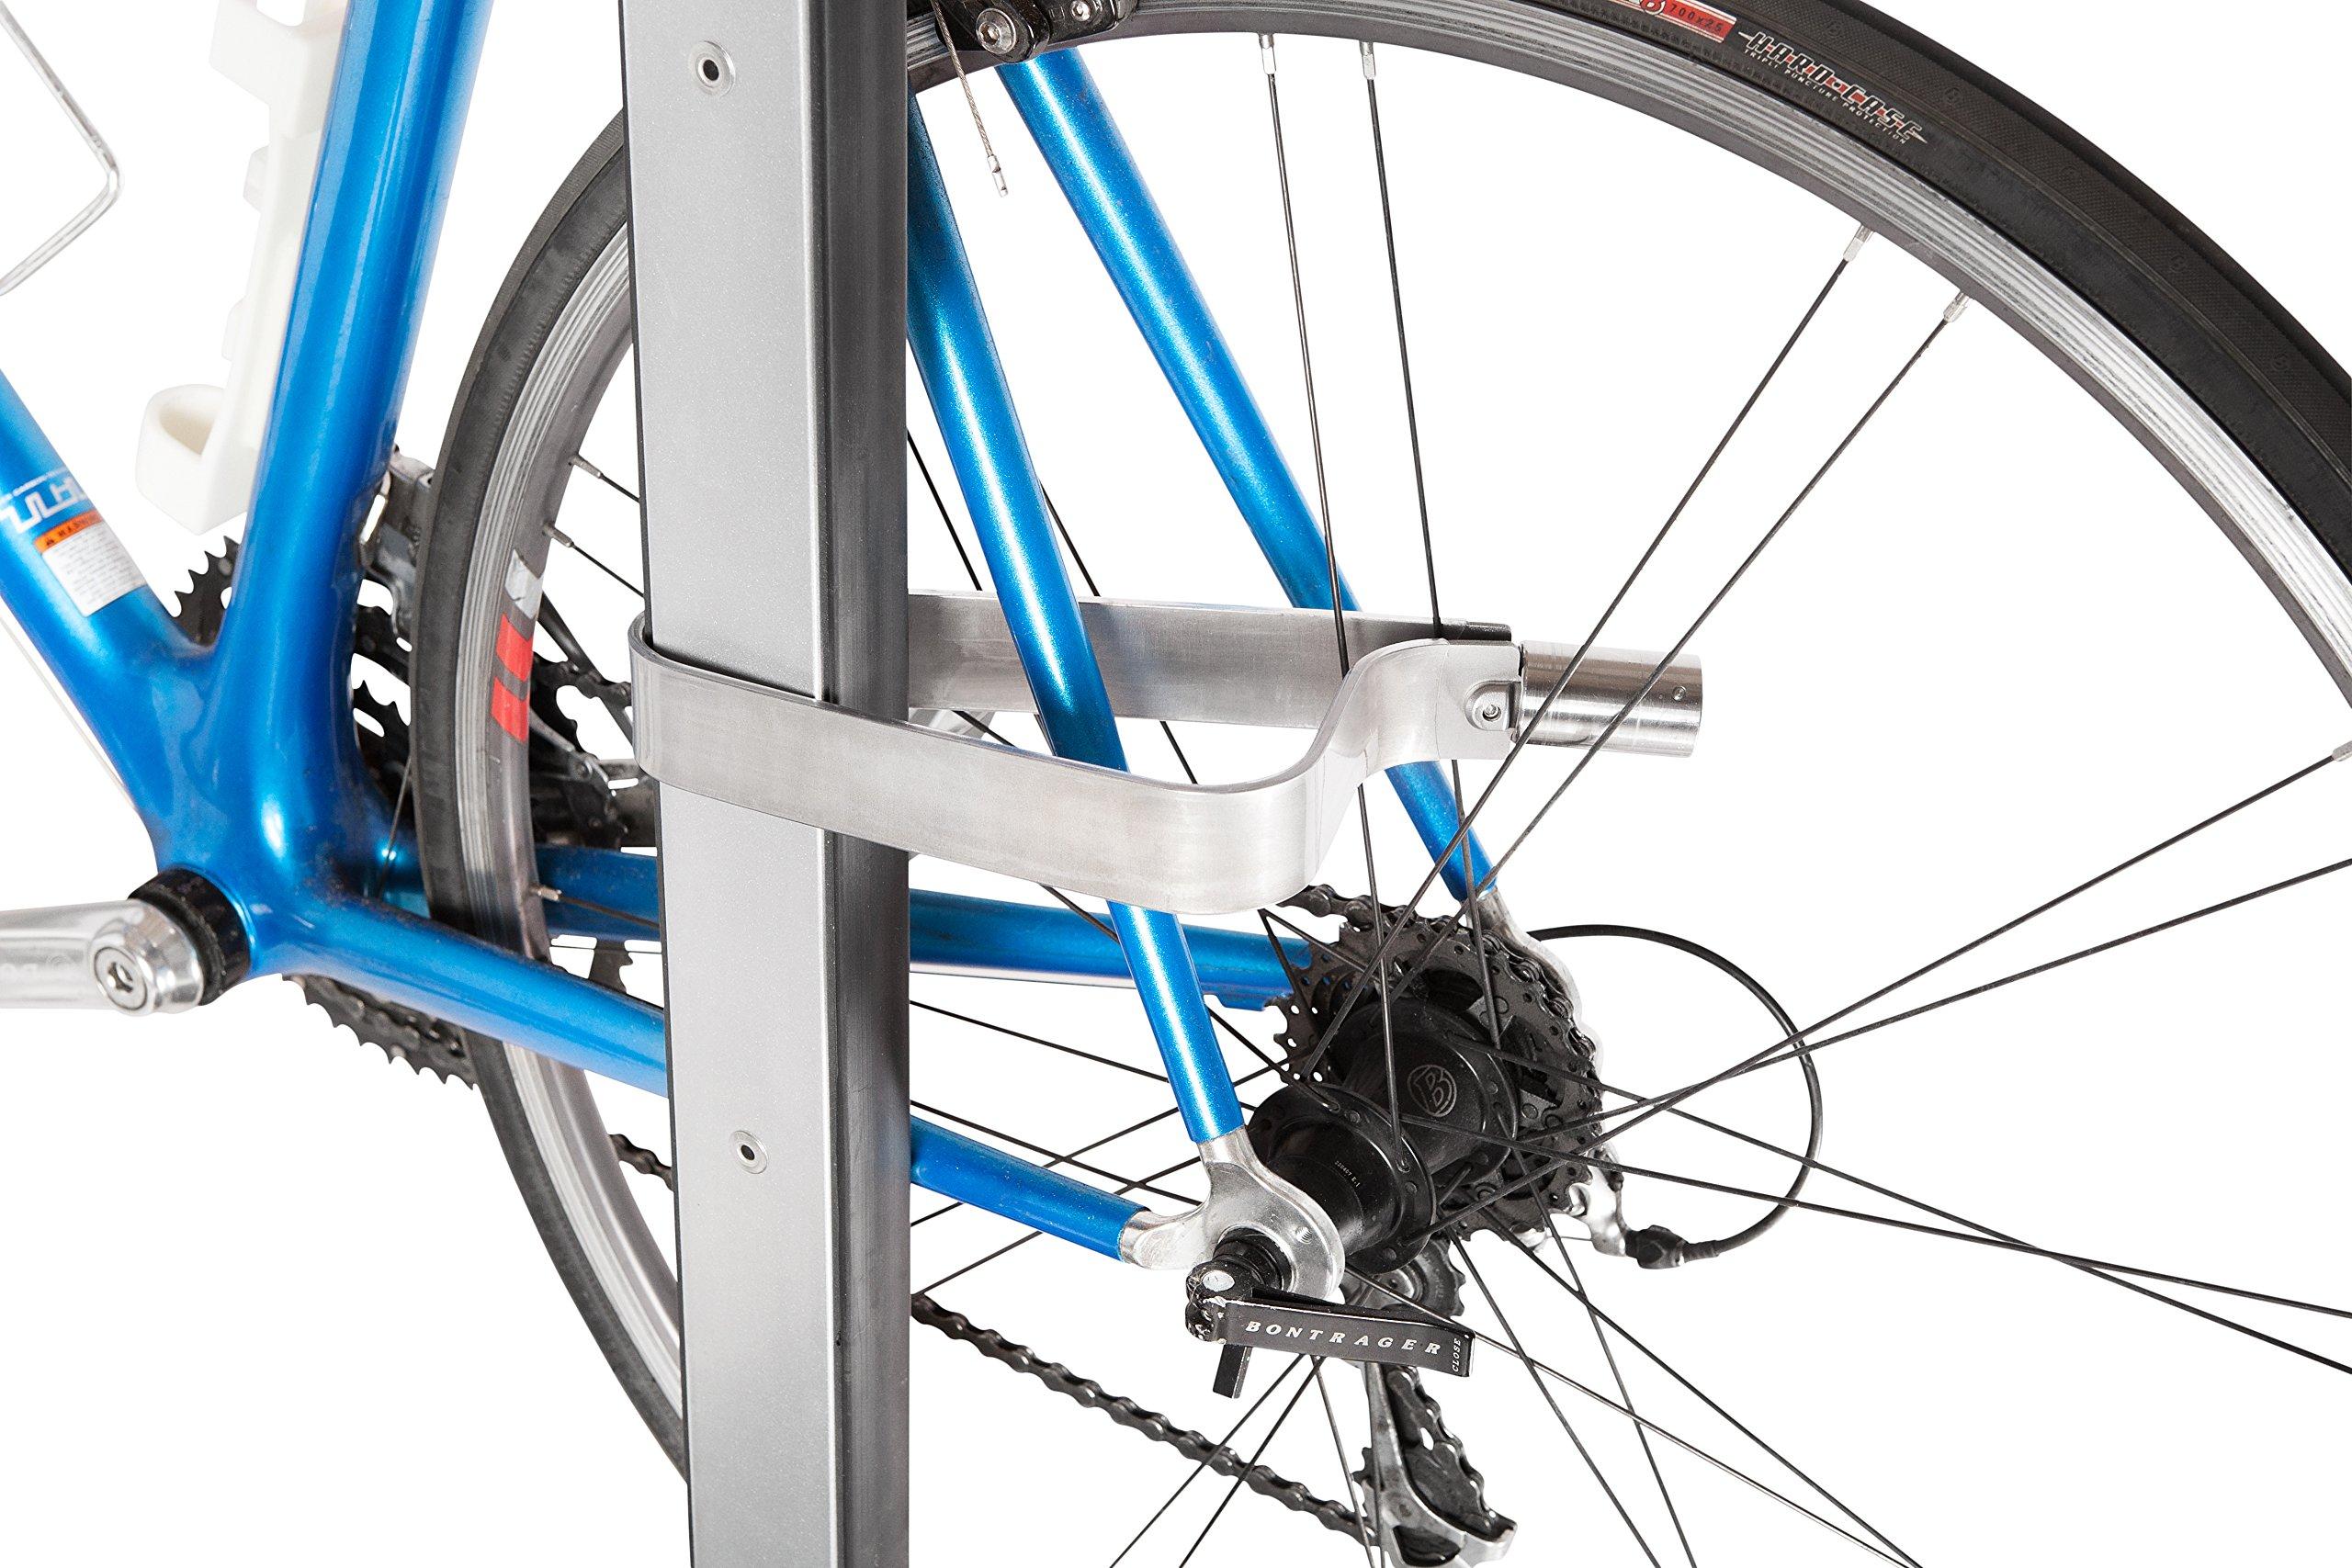 TIGR mini Lightweight Titanium Bicycle Lock & Mounting Clip by TIGR (Image #8)